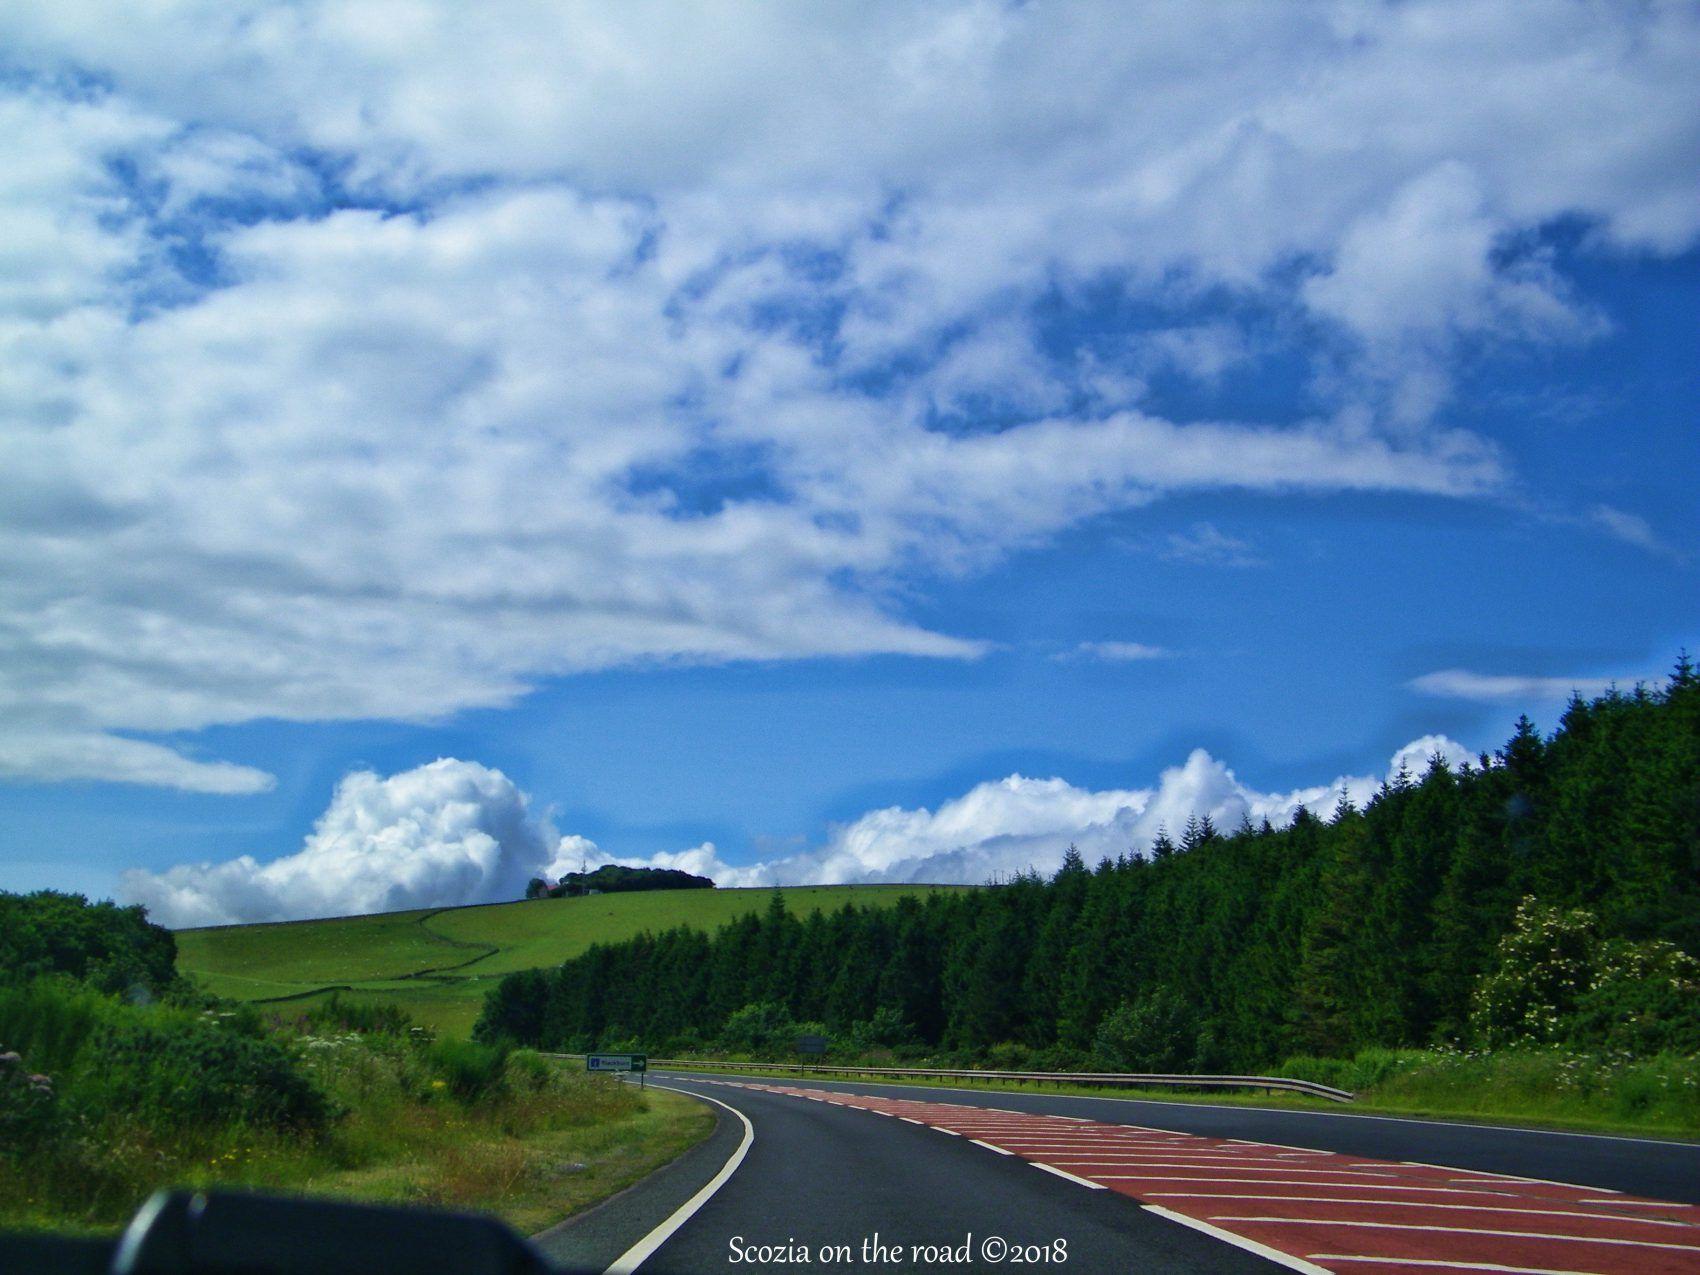 strada scozzese